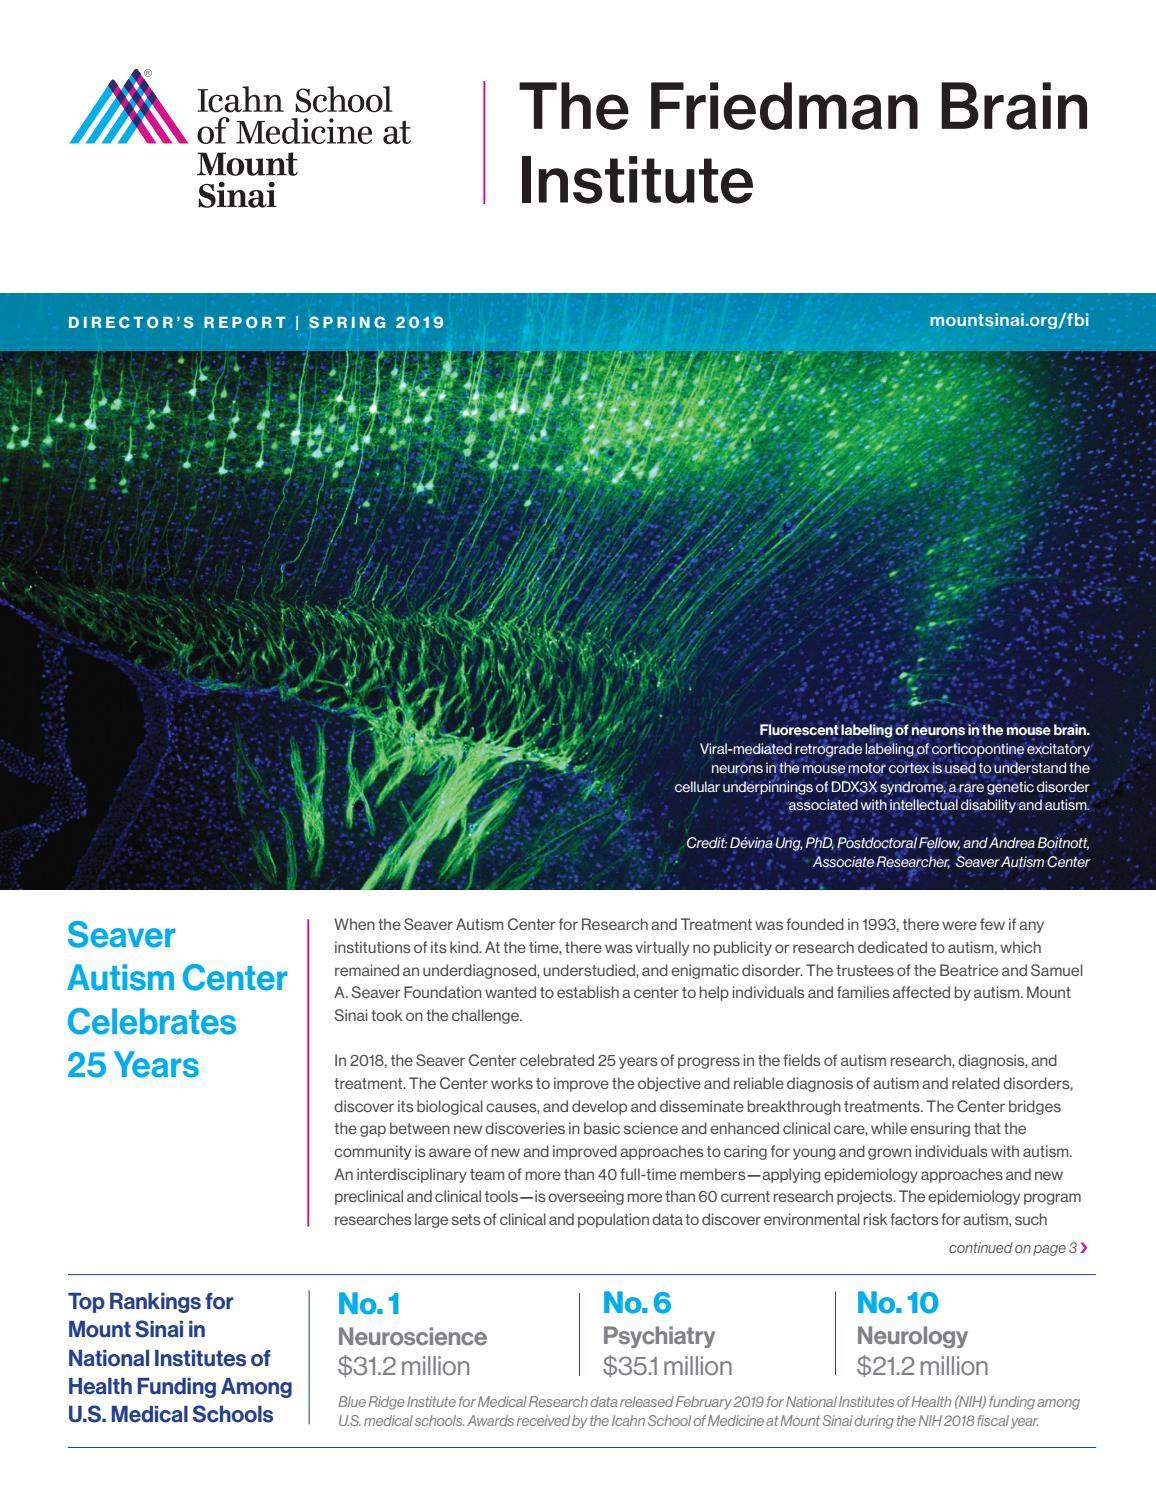 Mount sinai medical center neuroscience